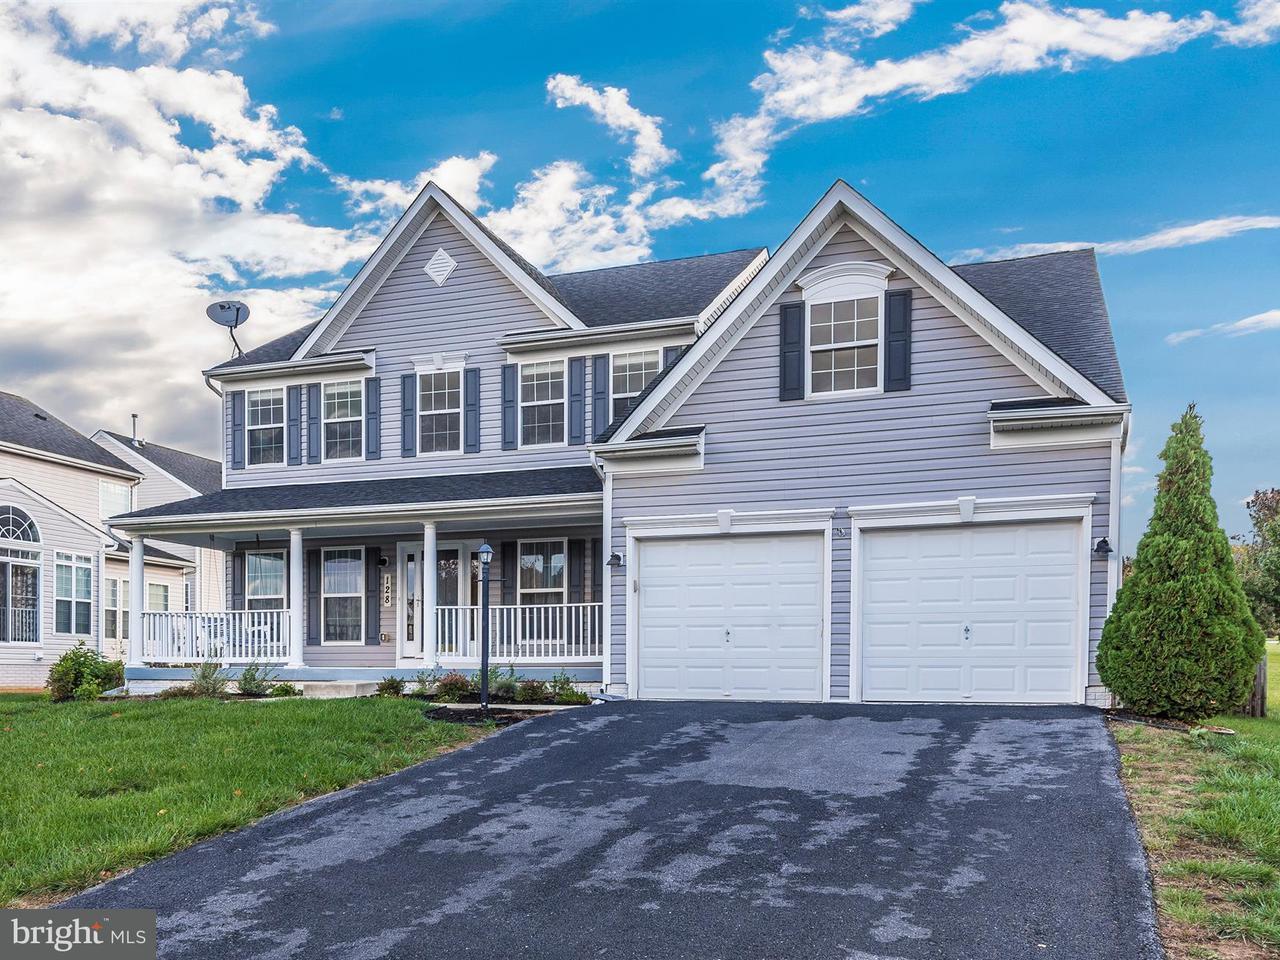 Additional photo for property listing at 128 GREENWICH Drive 128 GREENWICH Drive Walkersville, Μεριλαντ 21793 Ηνωμενεσ Πολιτειεσ